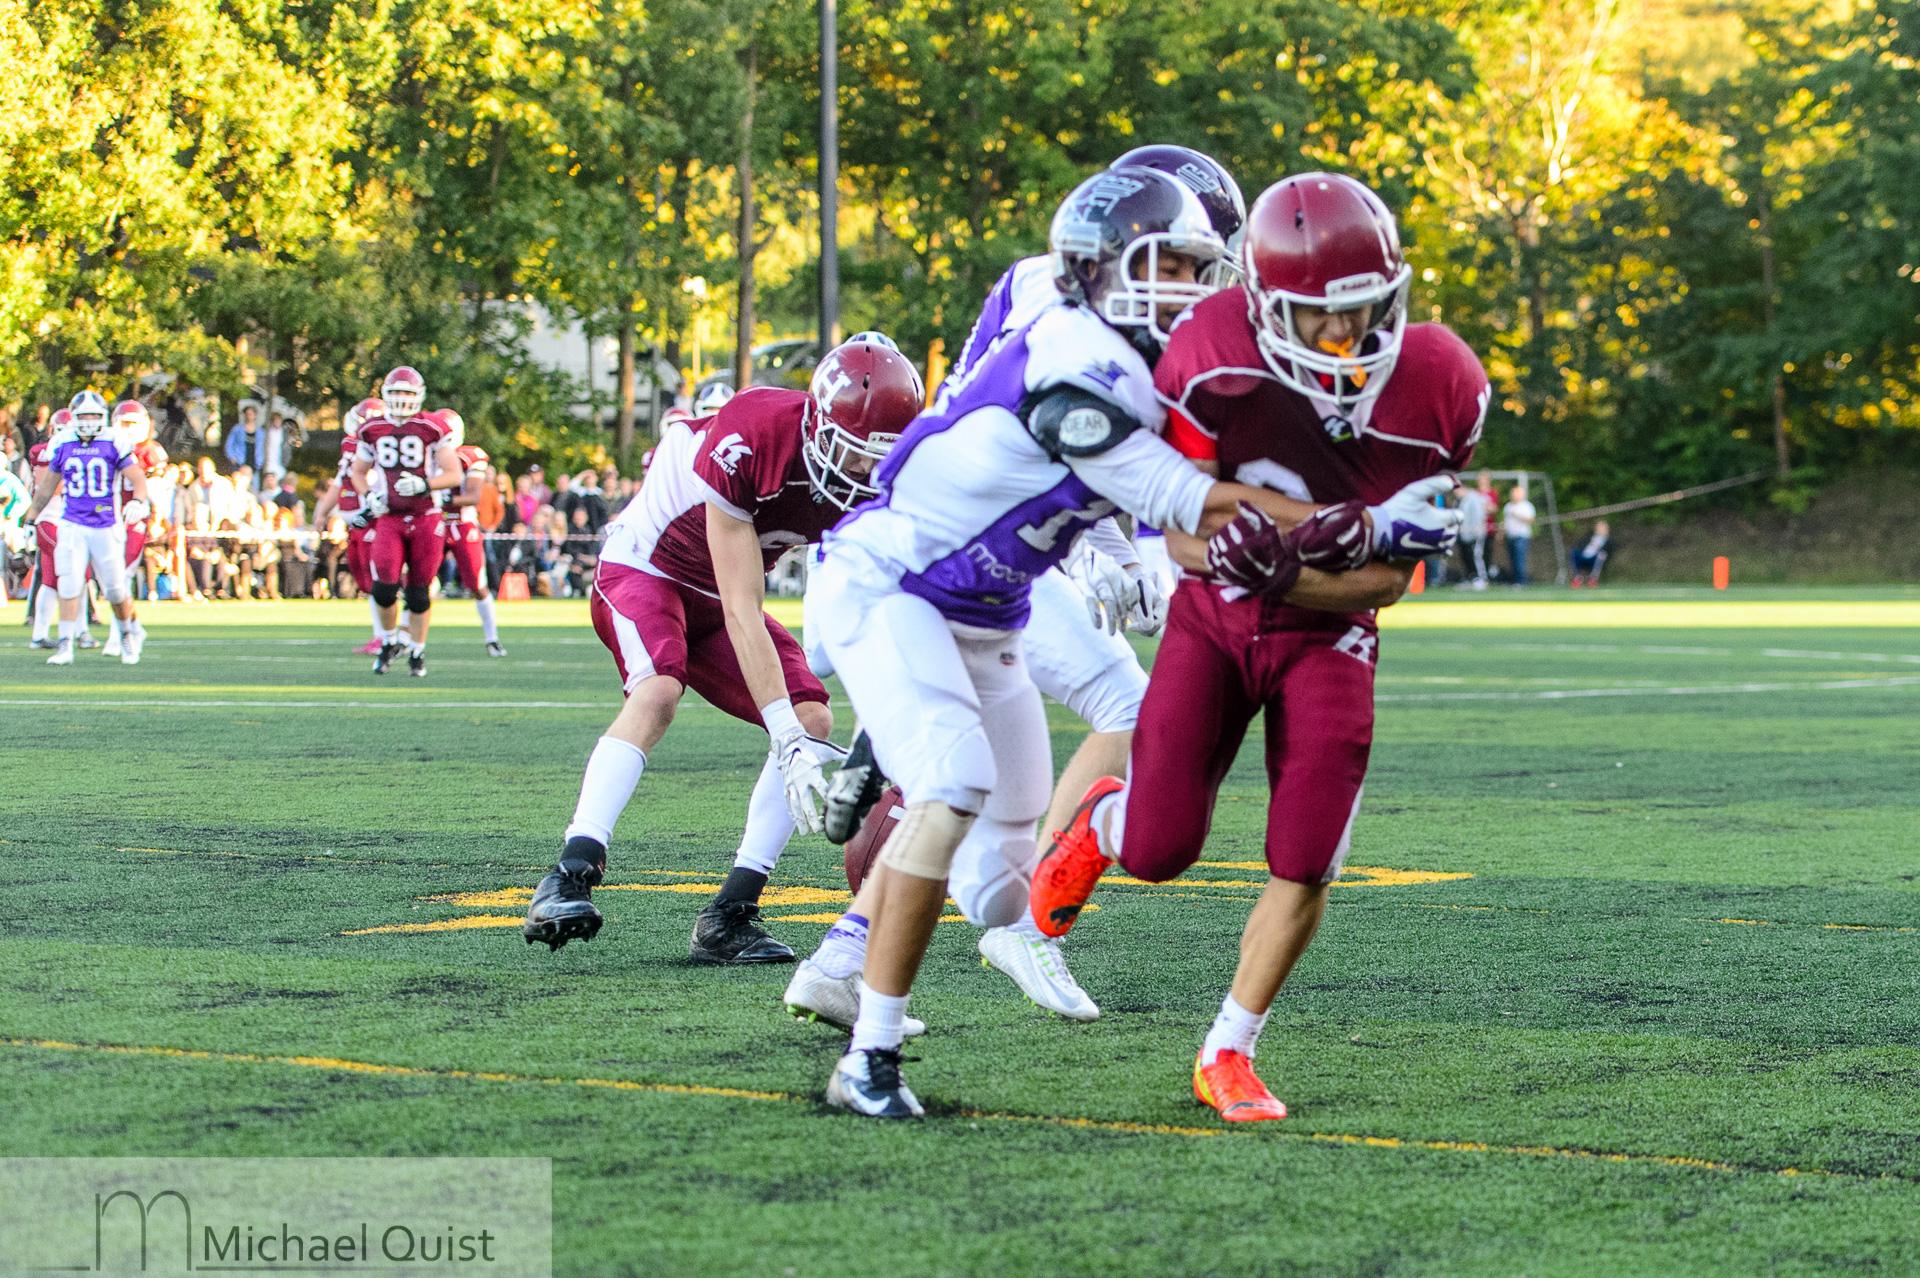 Junior-Bowl-2015-Copenhagen-Towers-vs-Herlev-Rebels-65